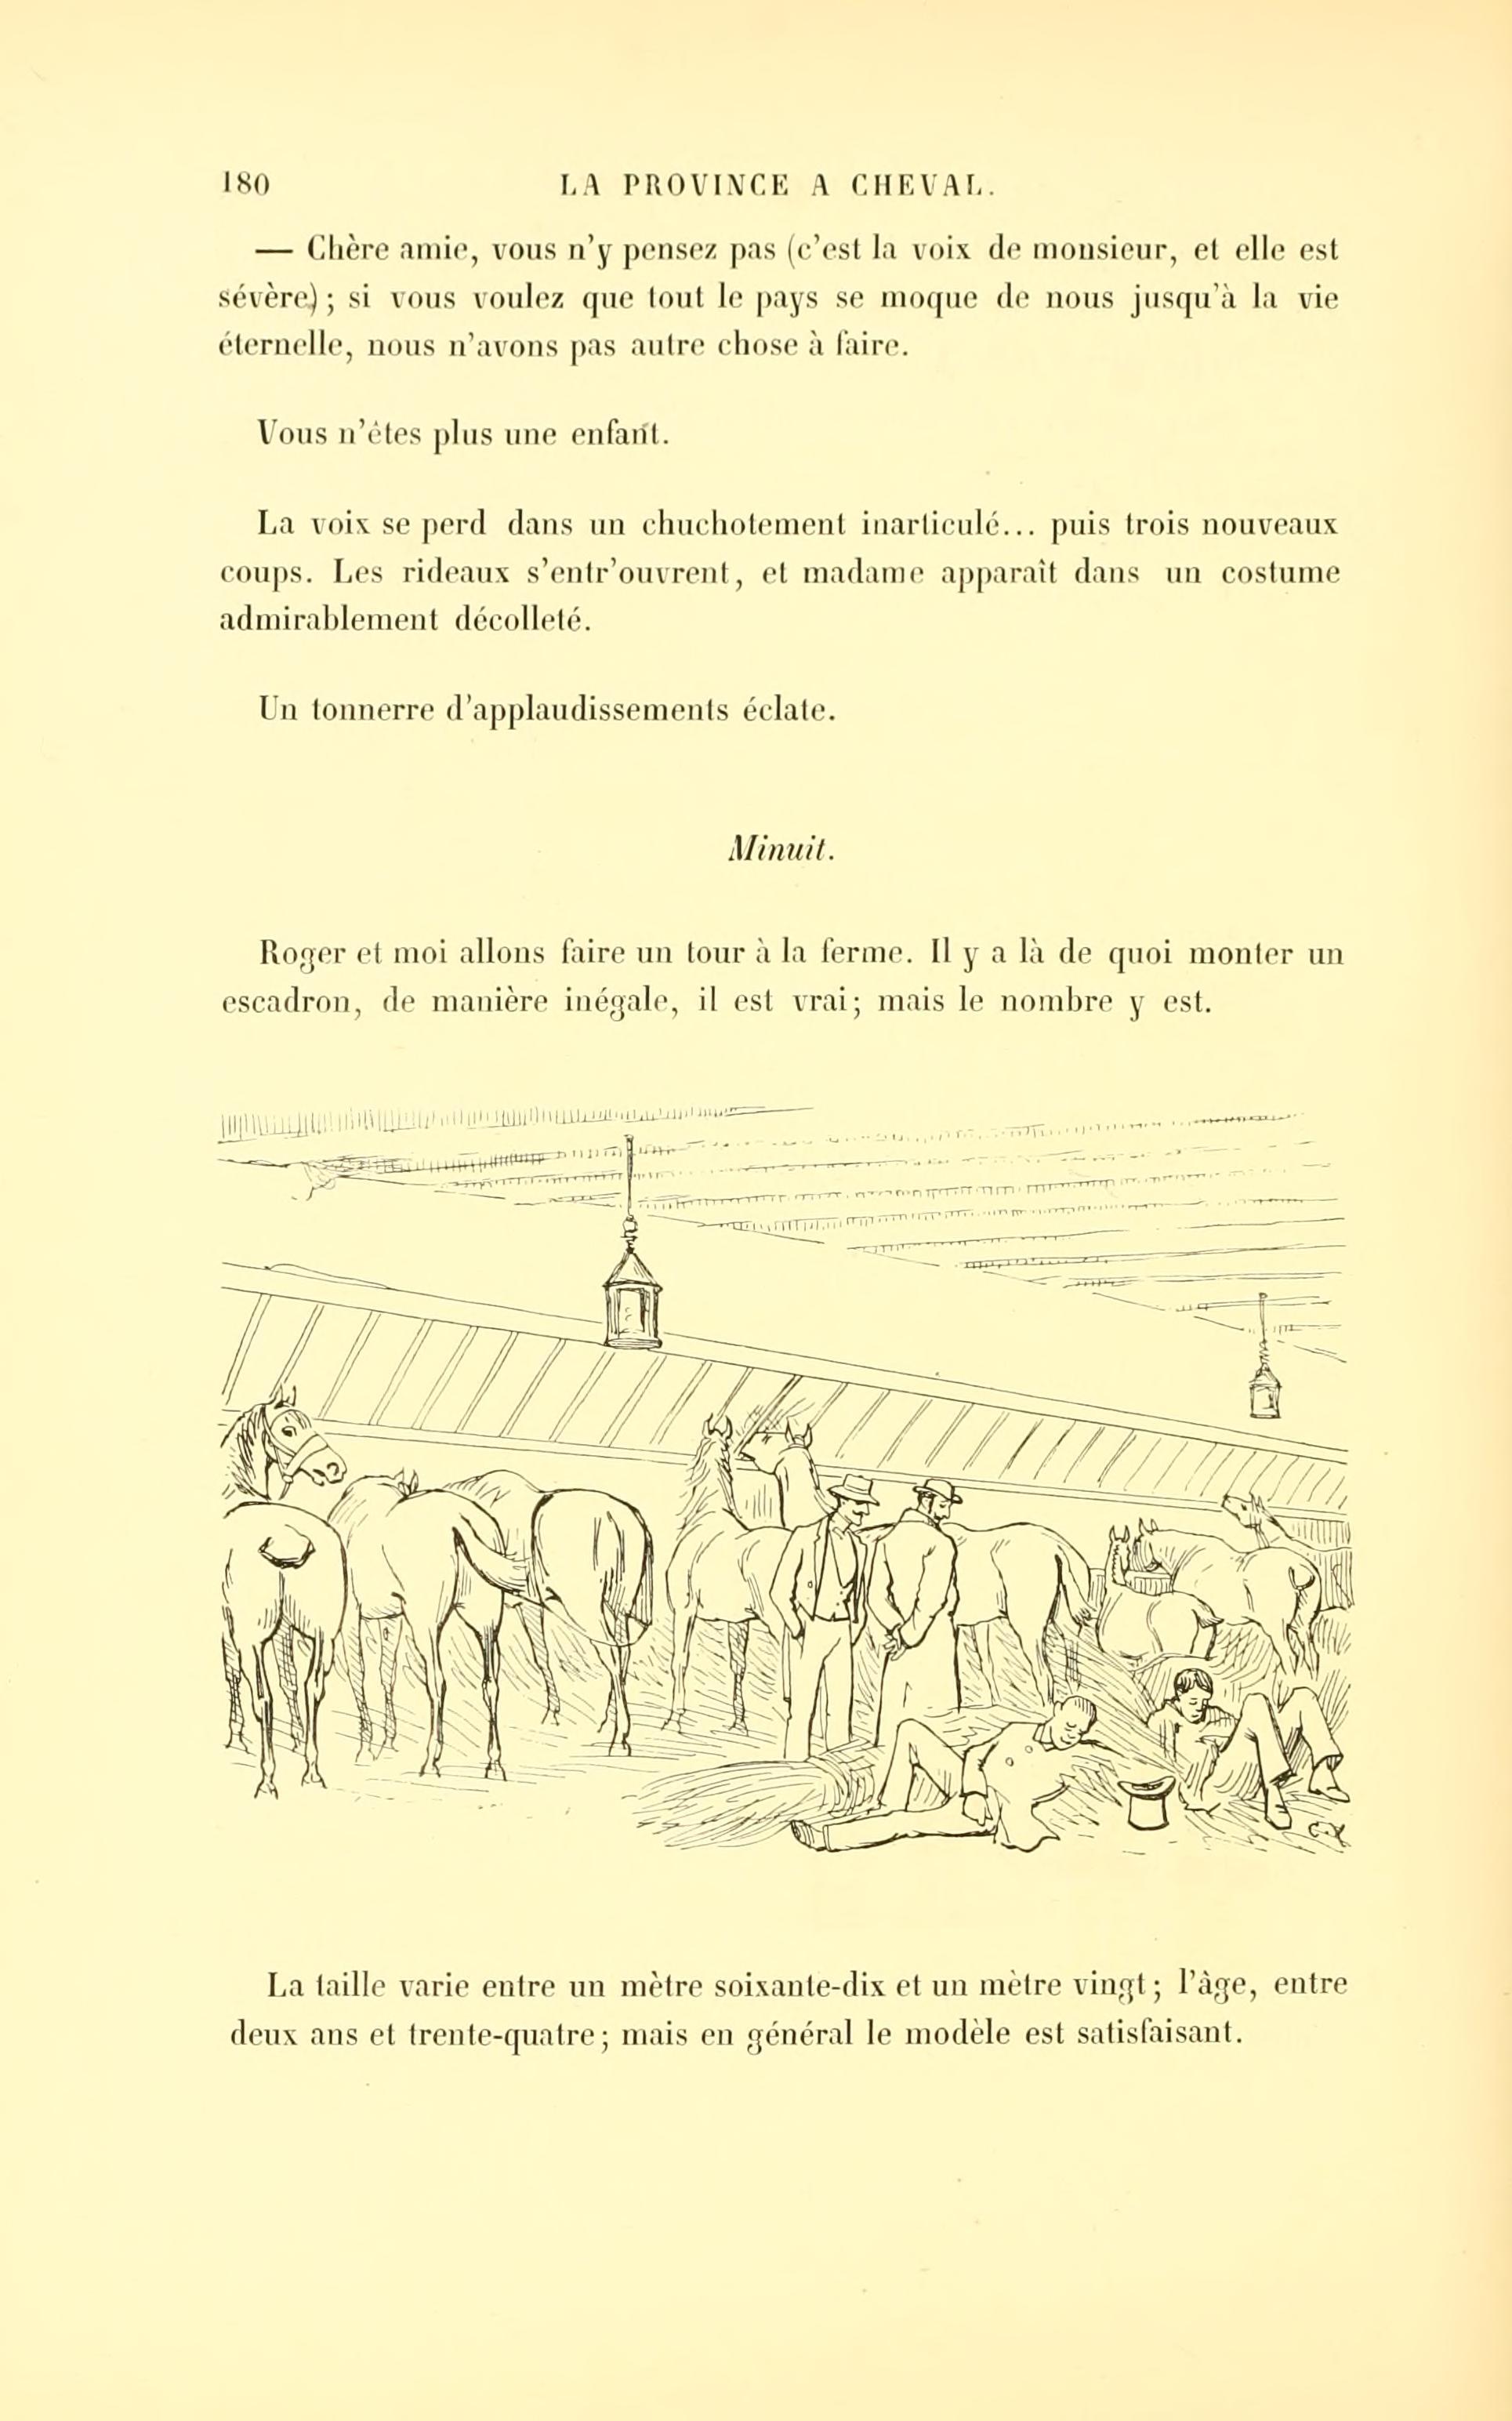 File:La province a cheval (Page 180) BHL20365081.jpg ...